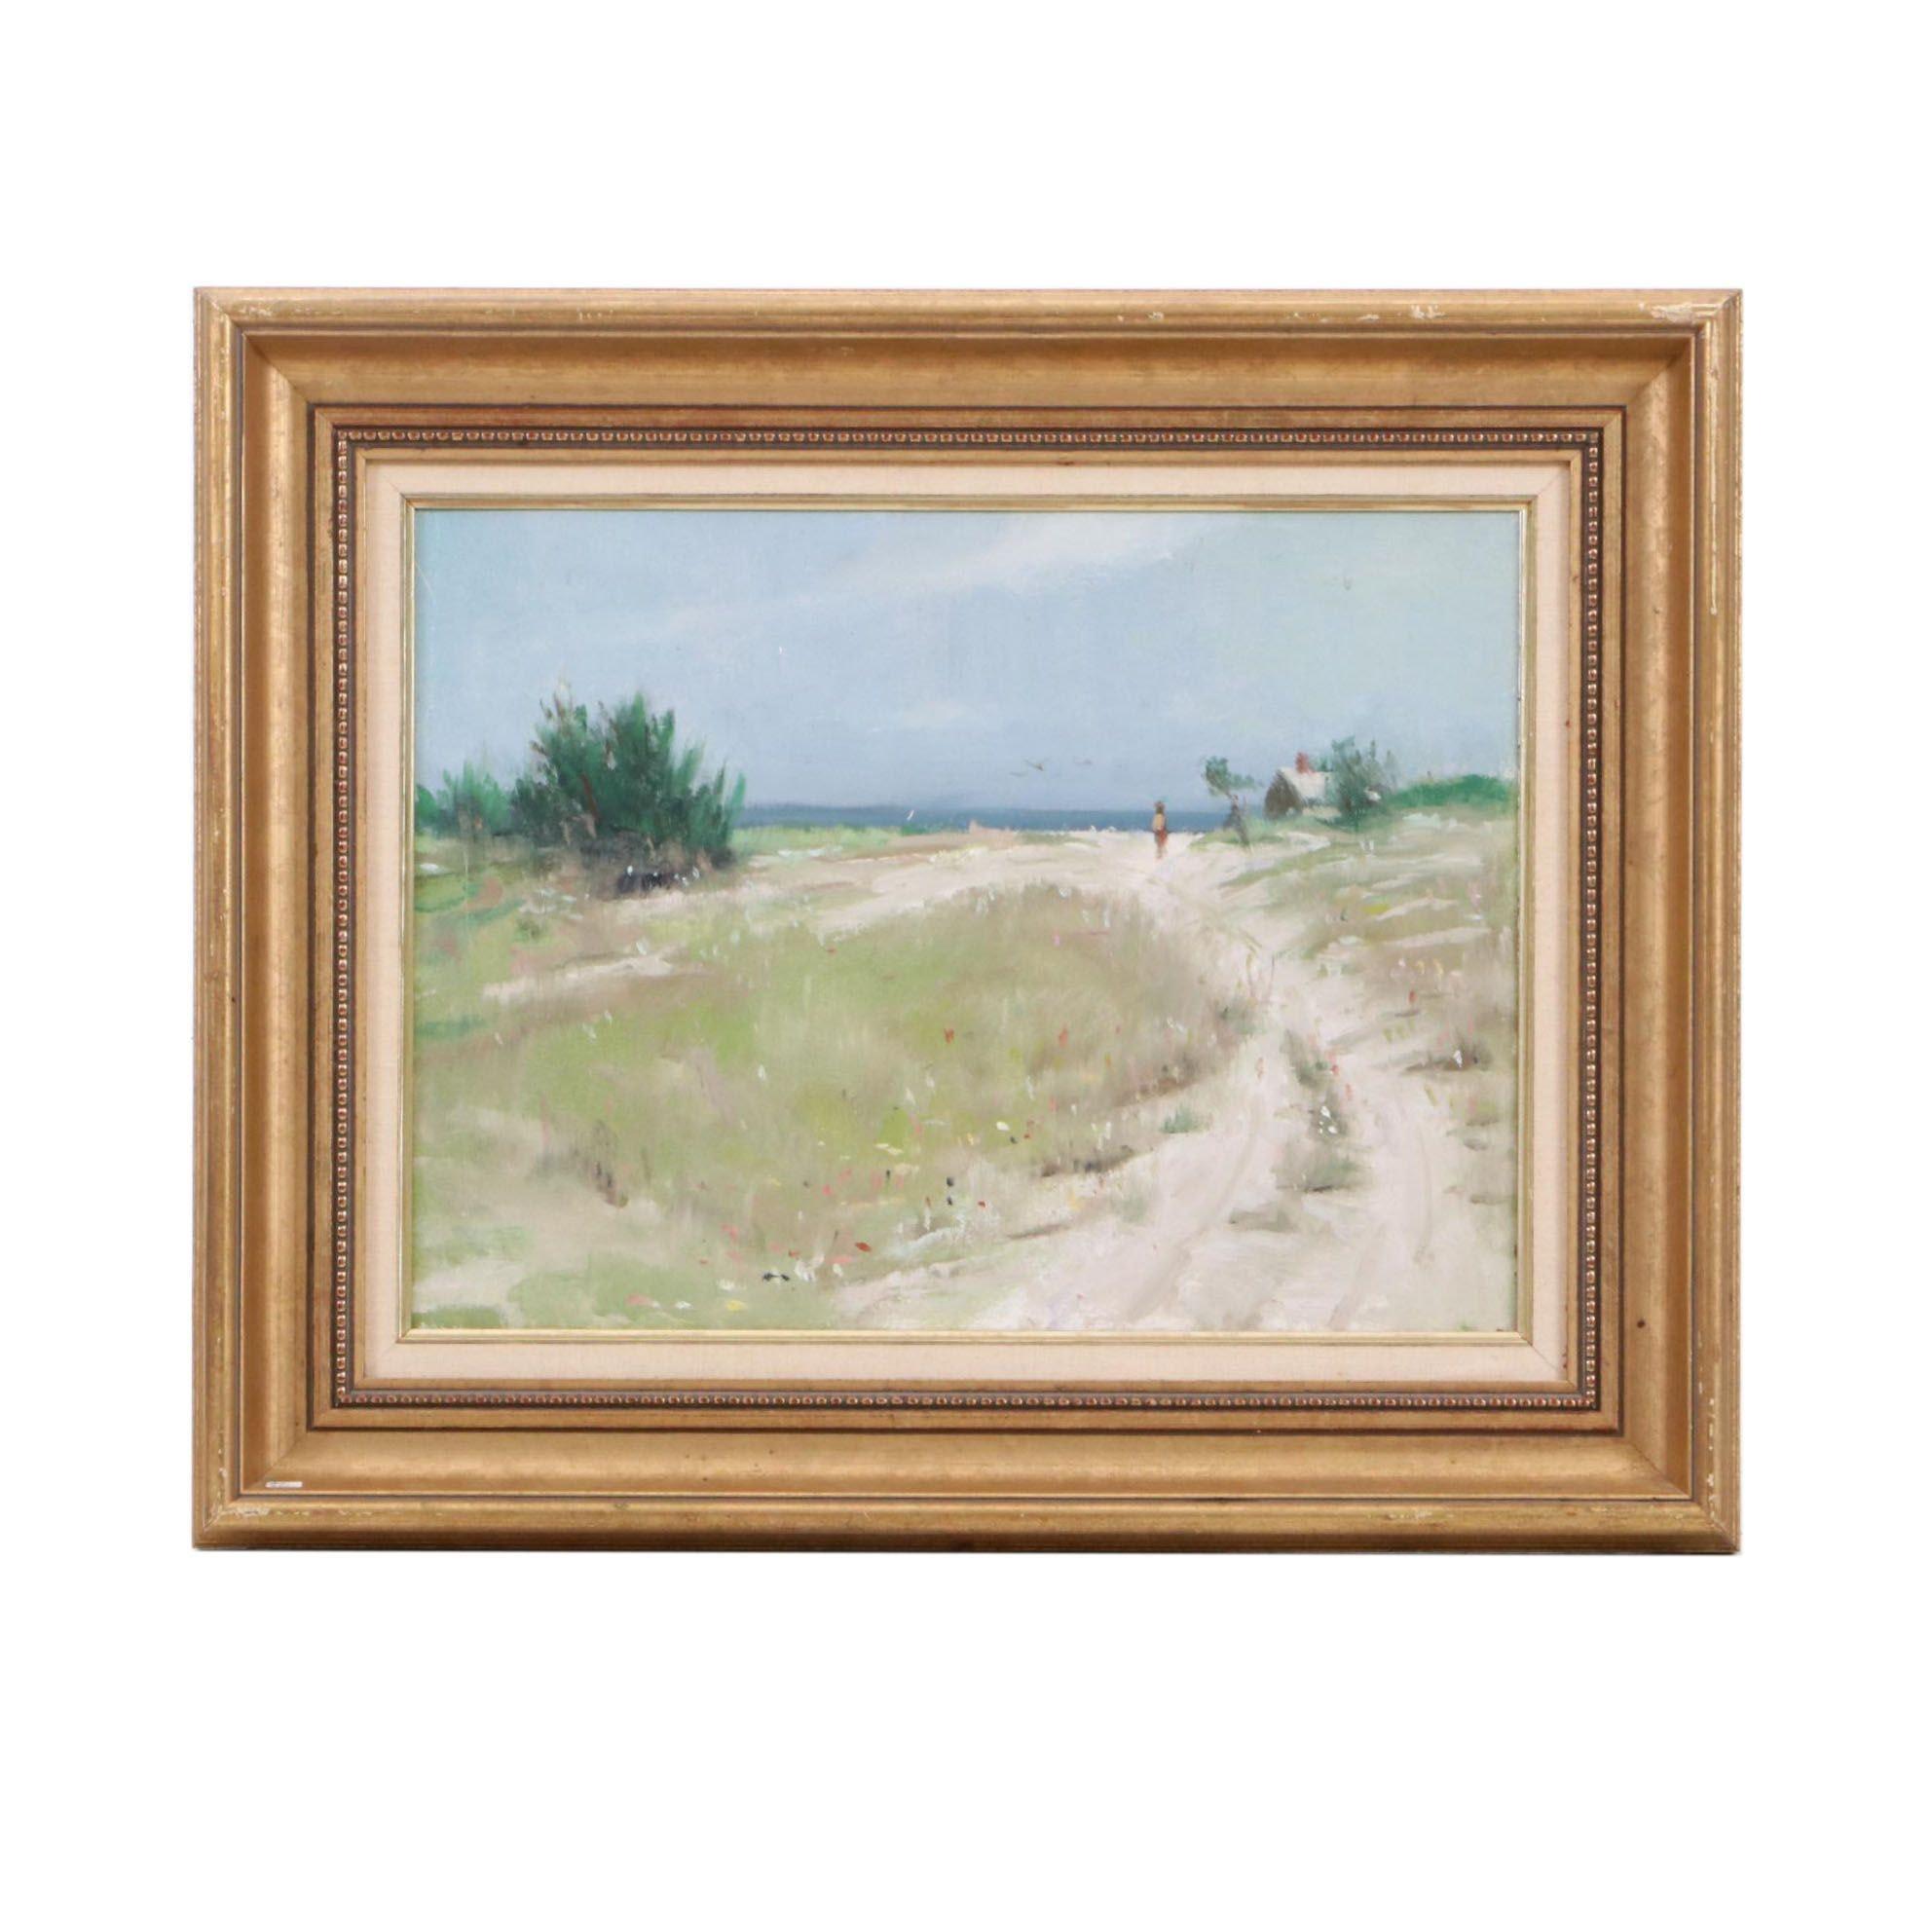 Harry Barton Oil Painting of a Coastal Landscape